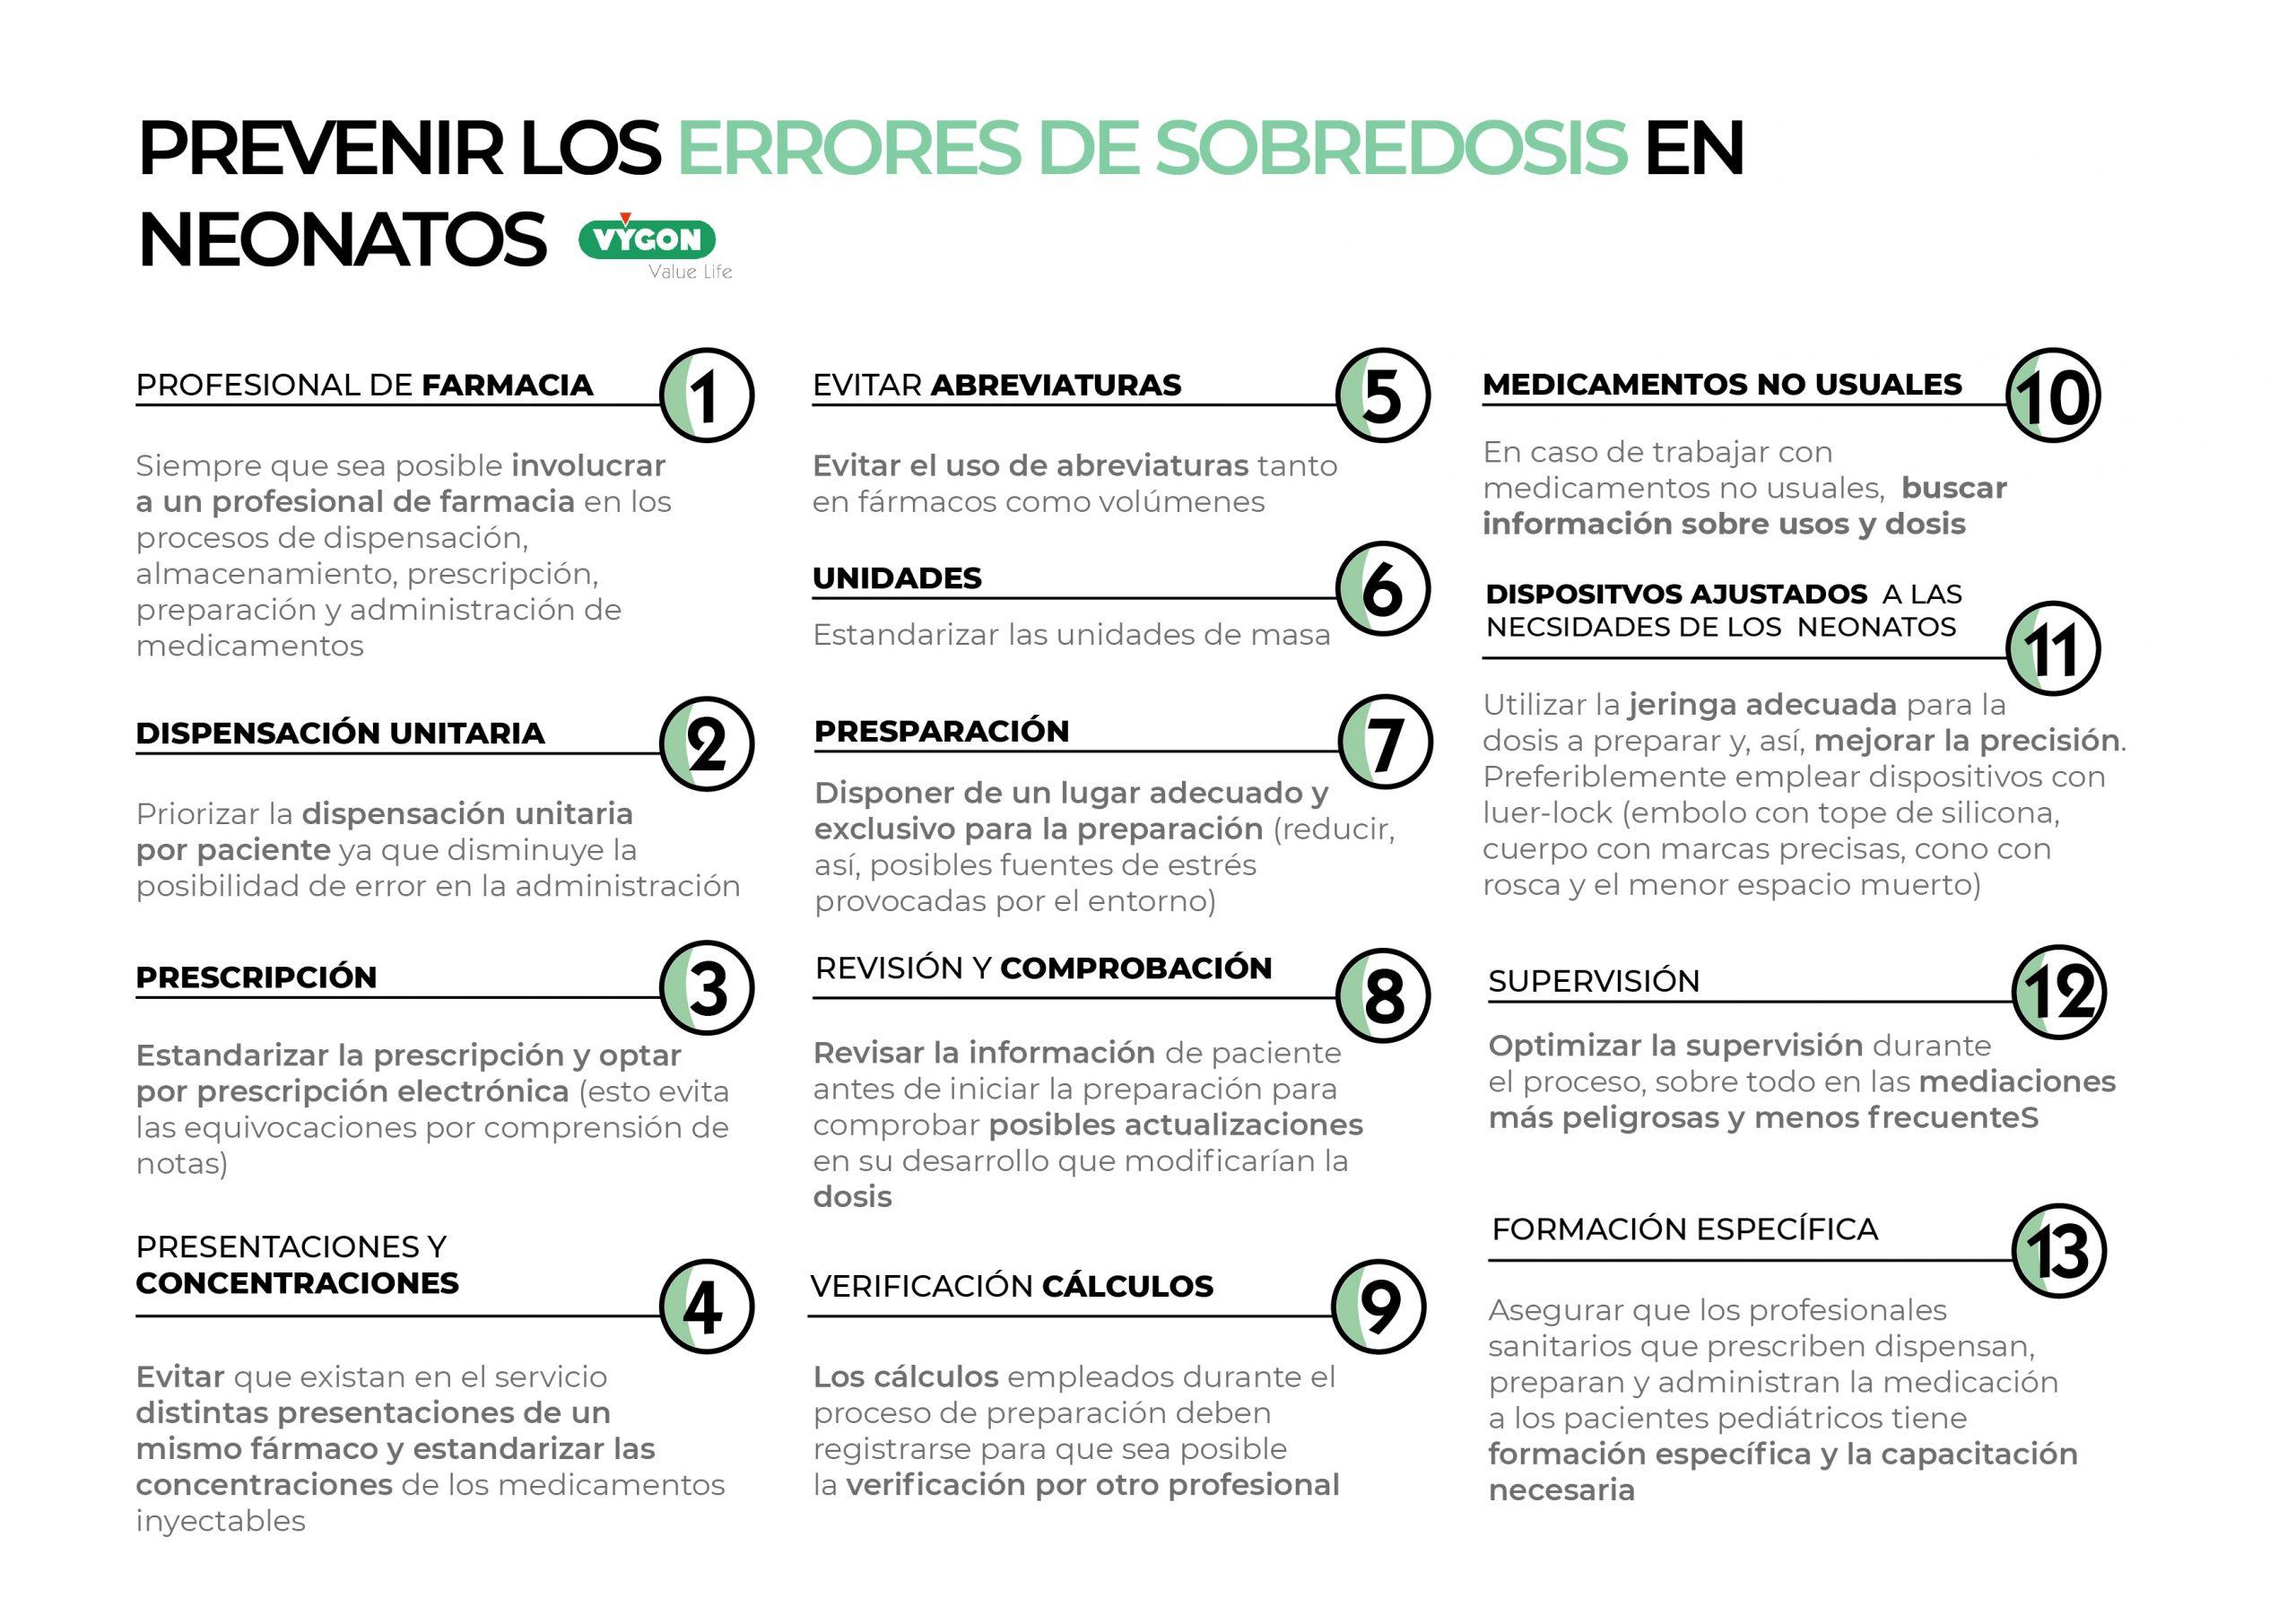 PREVENIR SOBREDOSIS Neonatos